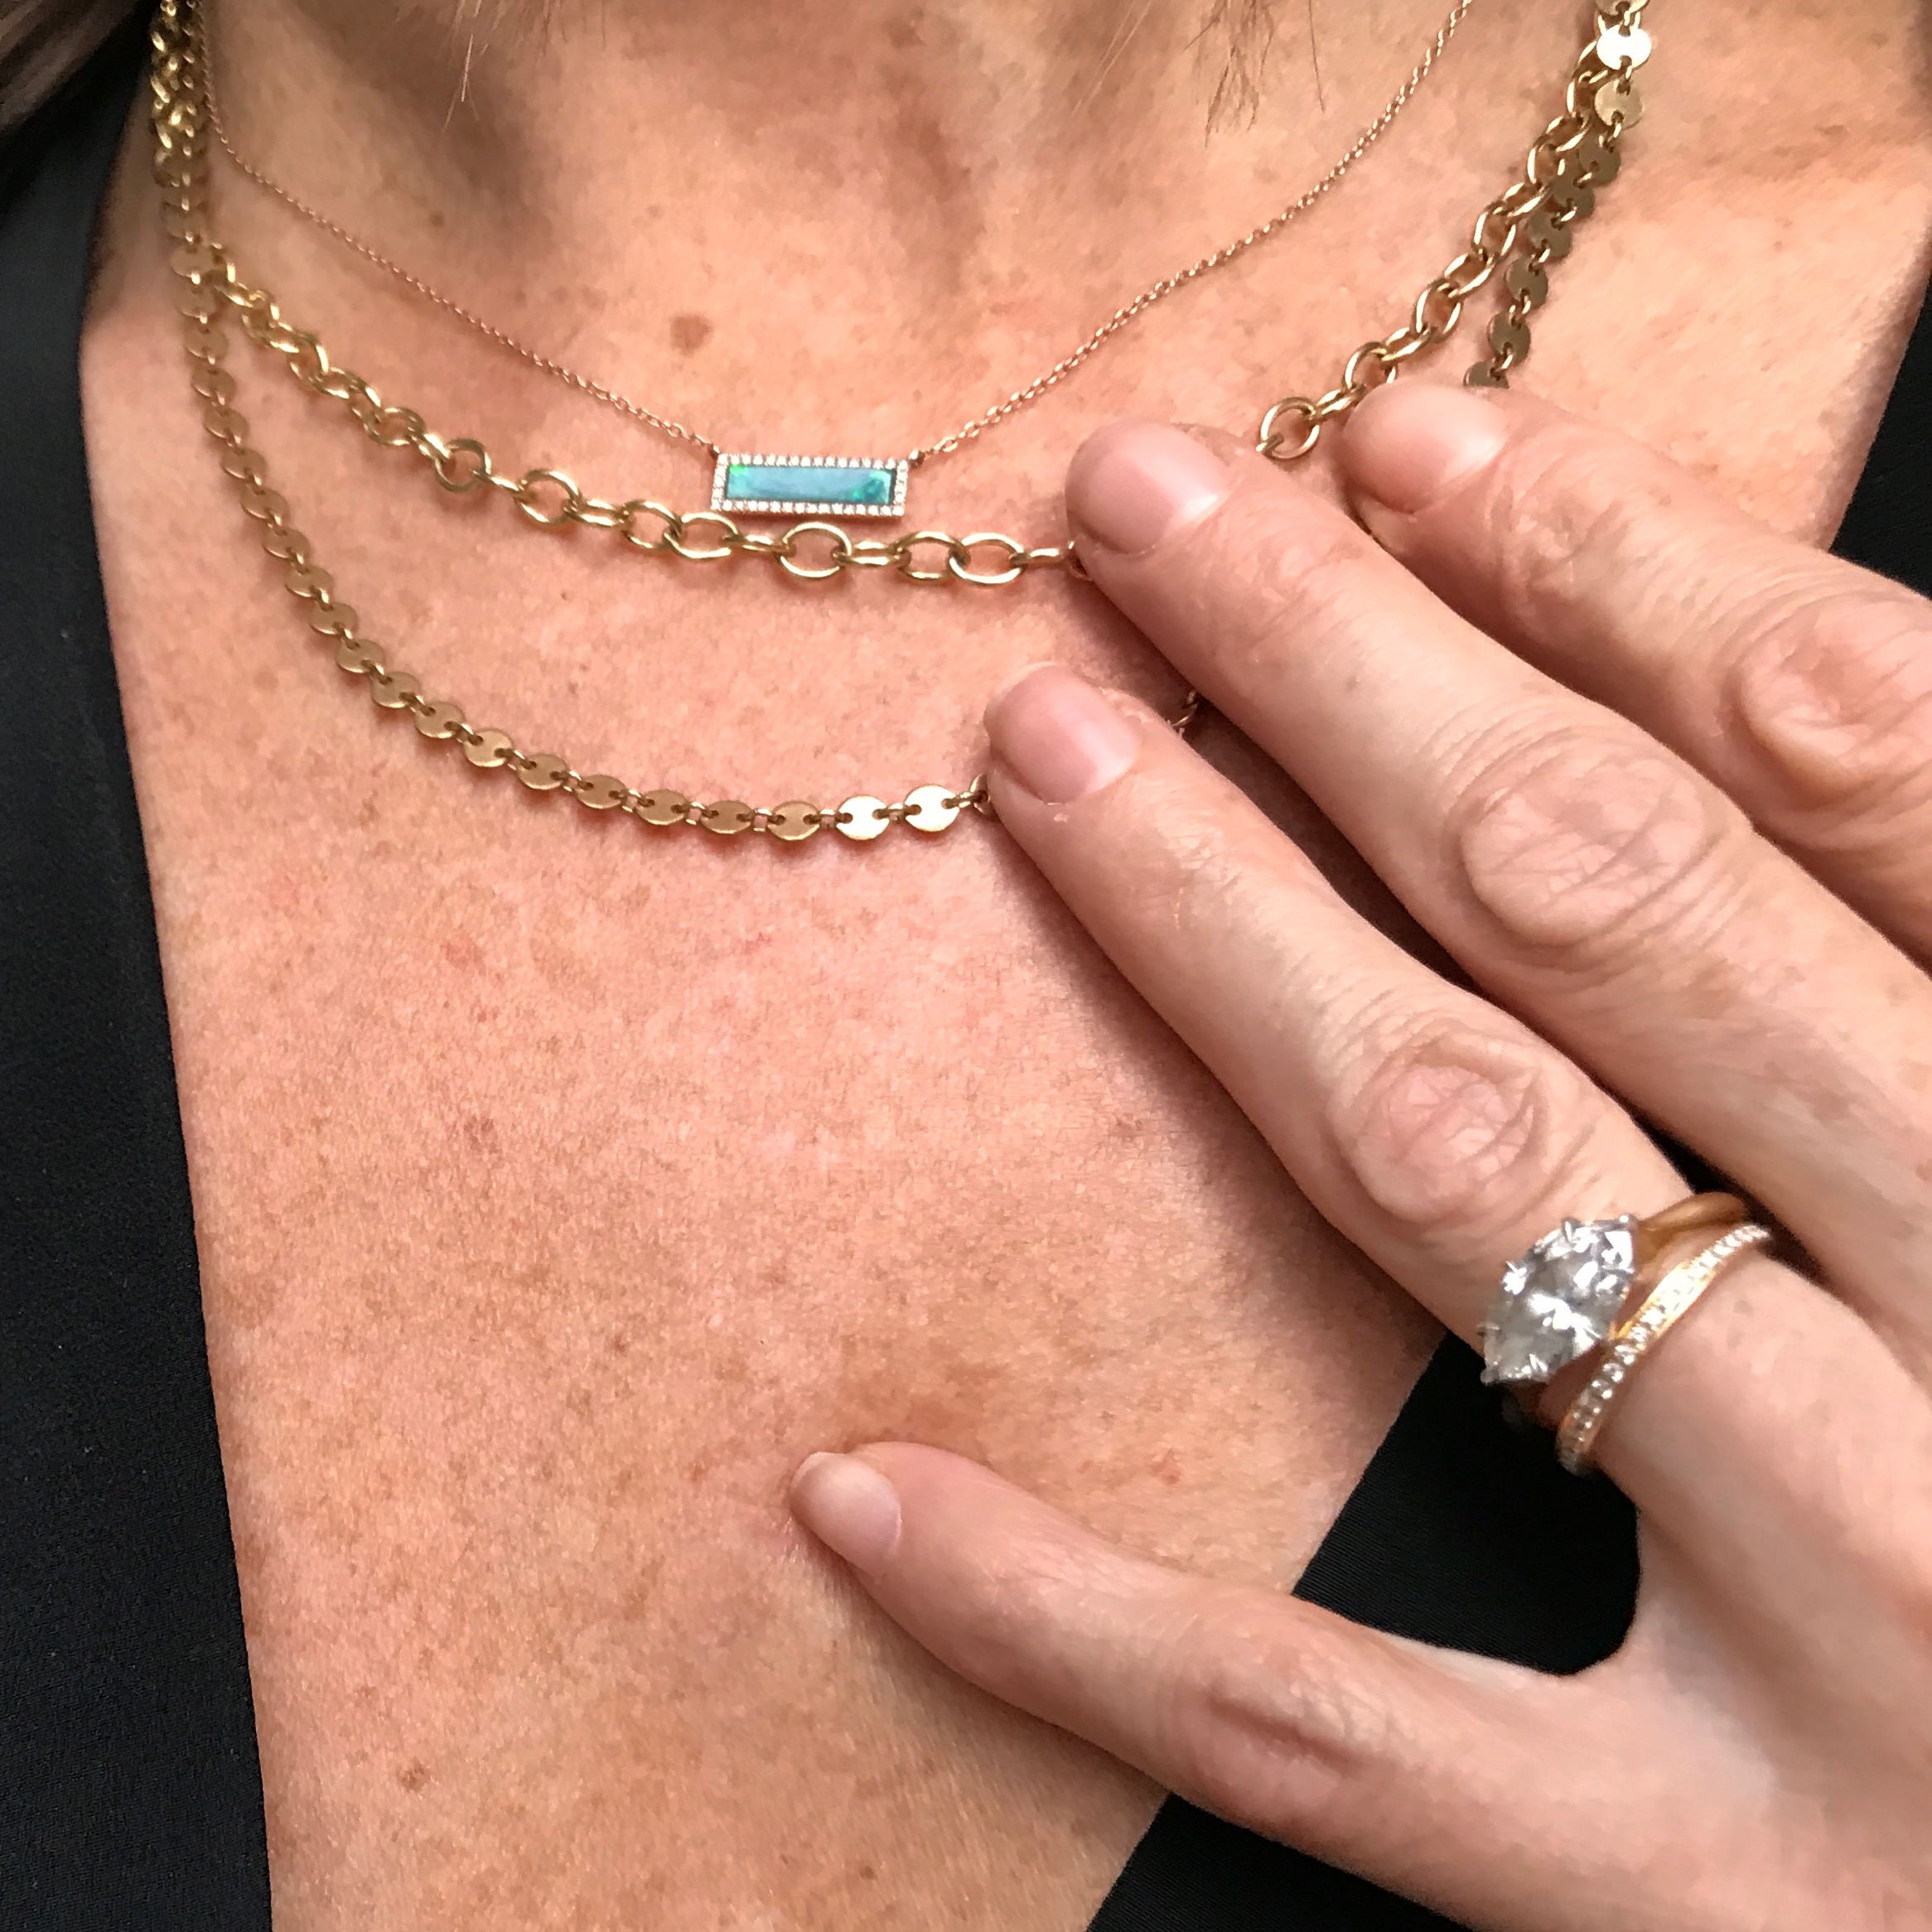 jewelry by Finn & Minor Obsessions